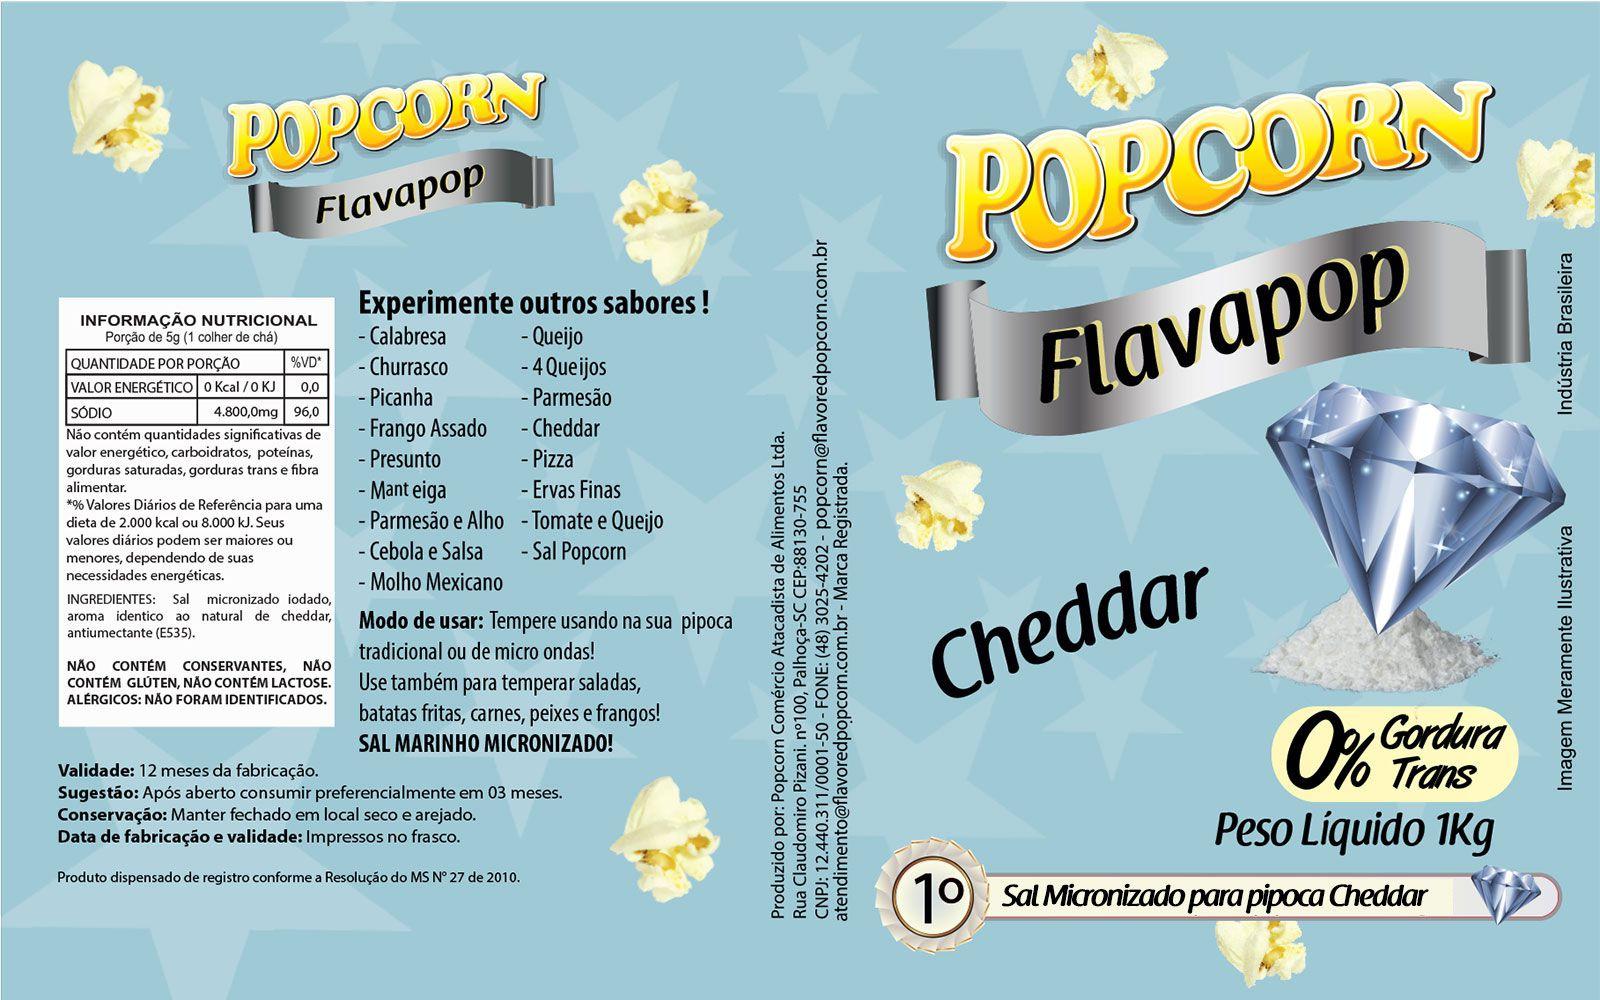 FLAVAPOP - Original de cinema -  Cheddar - Micronizado Popcorn  - Pct 1kg